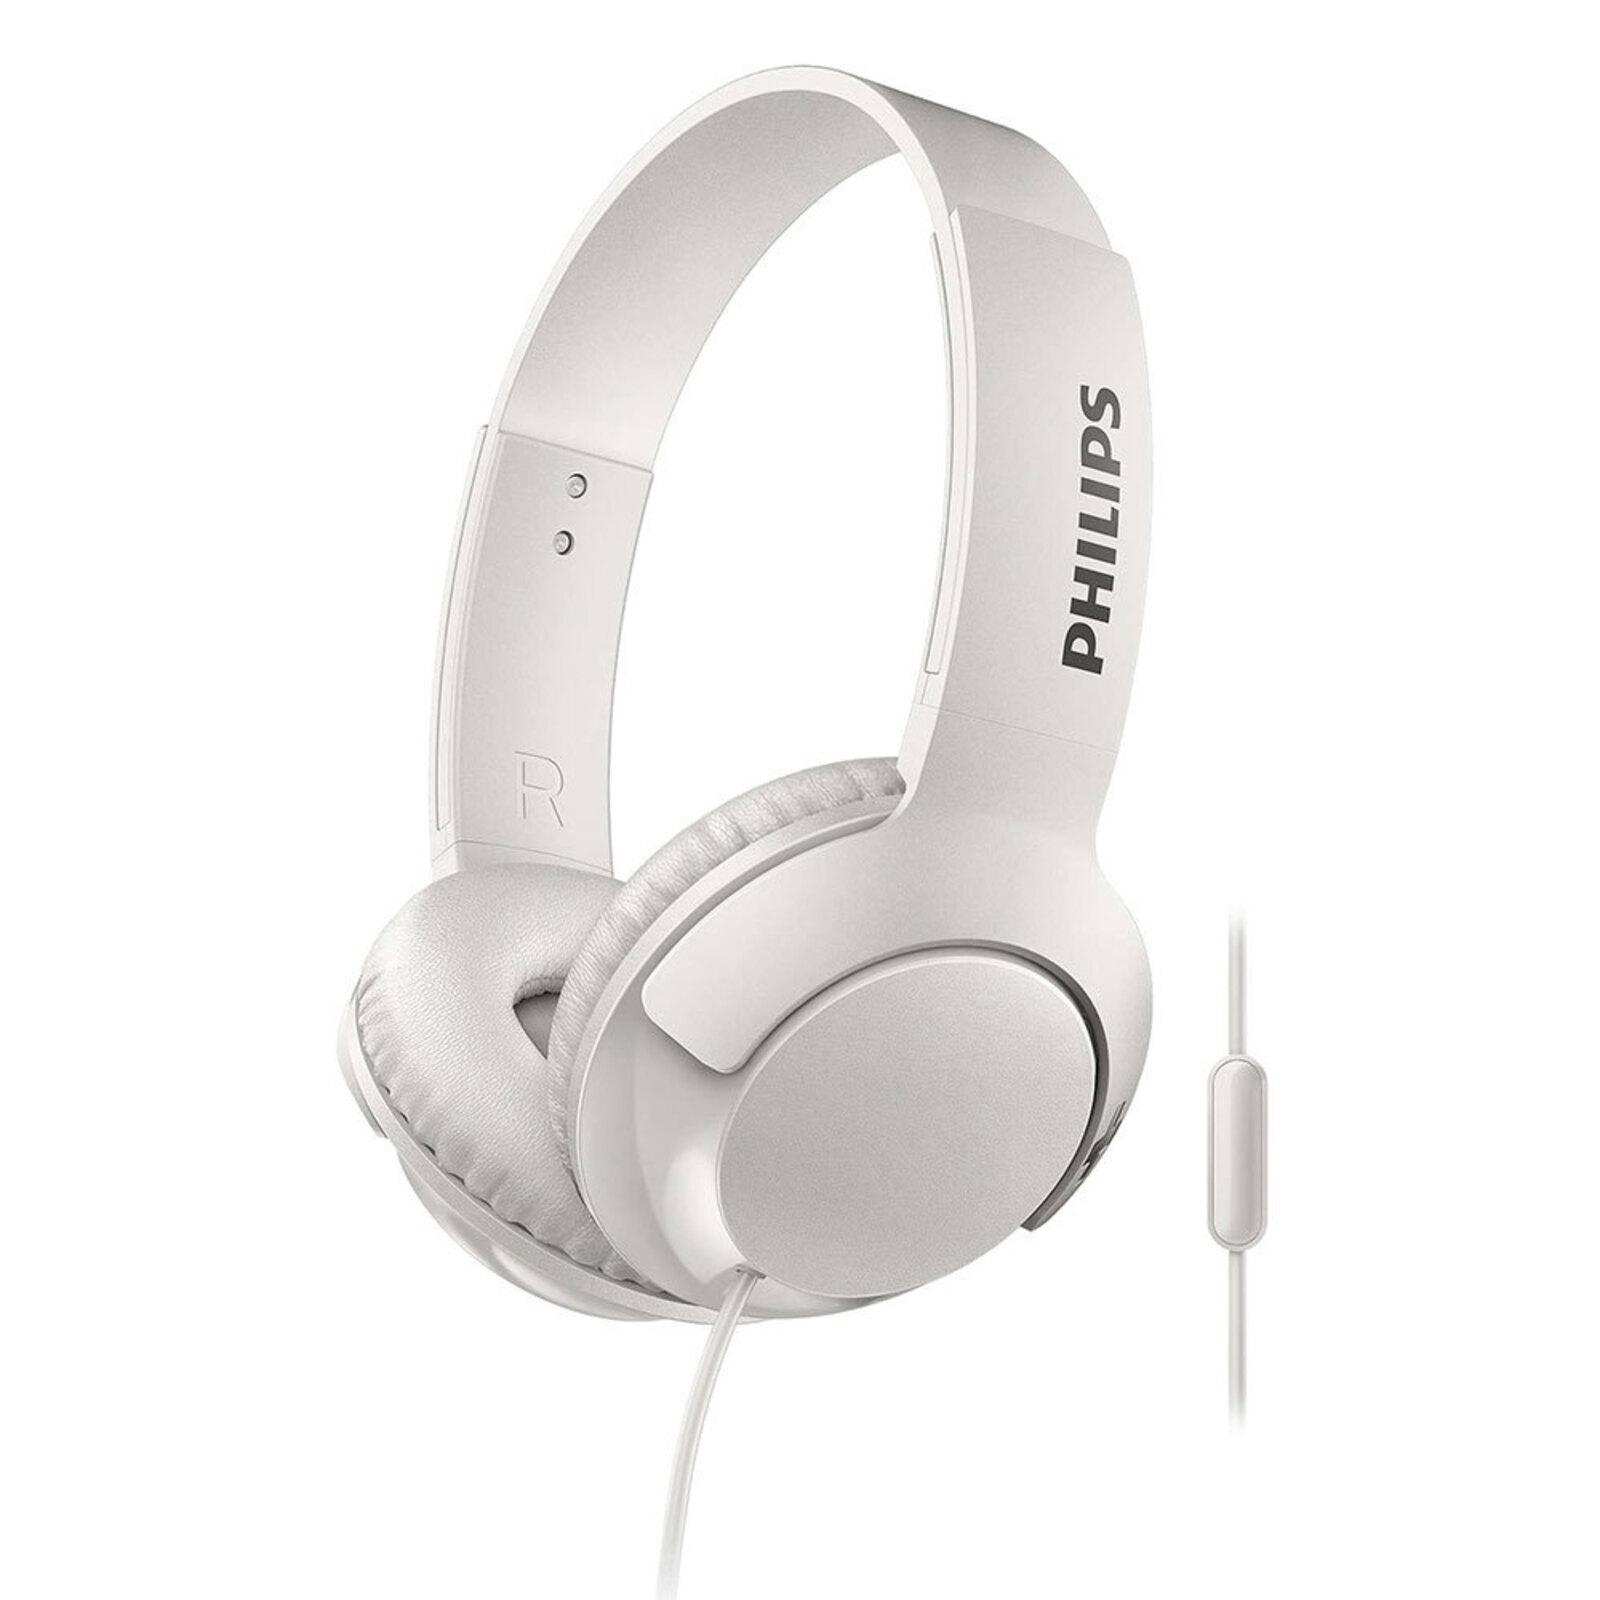 Philips SHL3075WT Headphones Headband Headset mic for Smartphones Apple Android